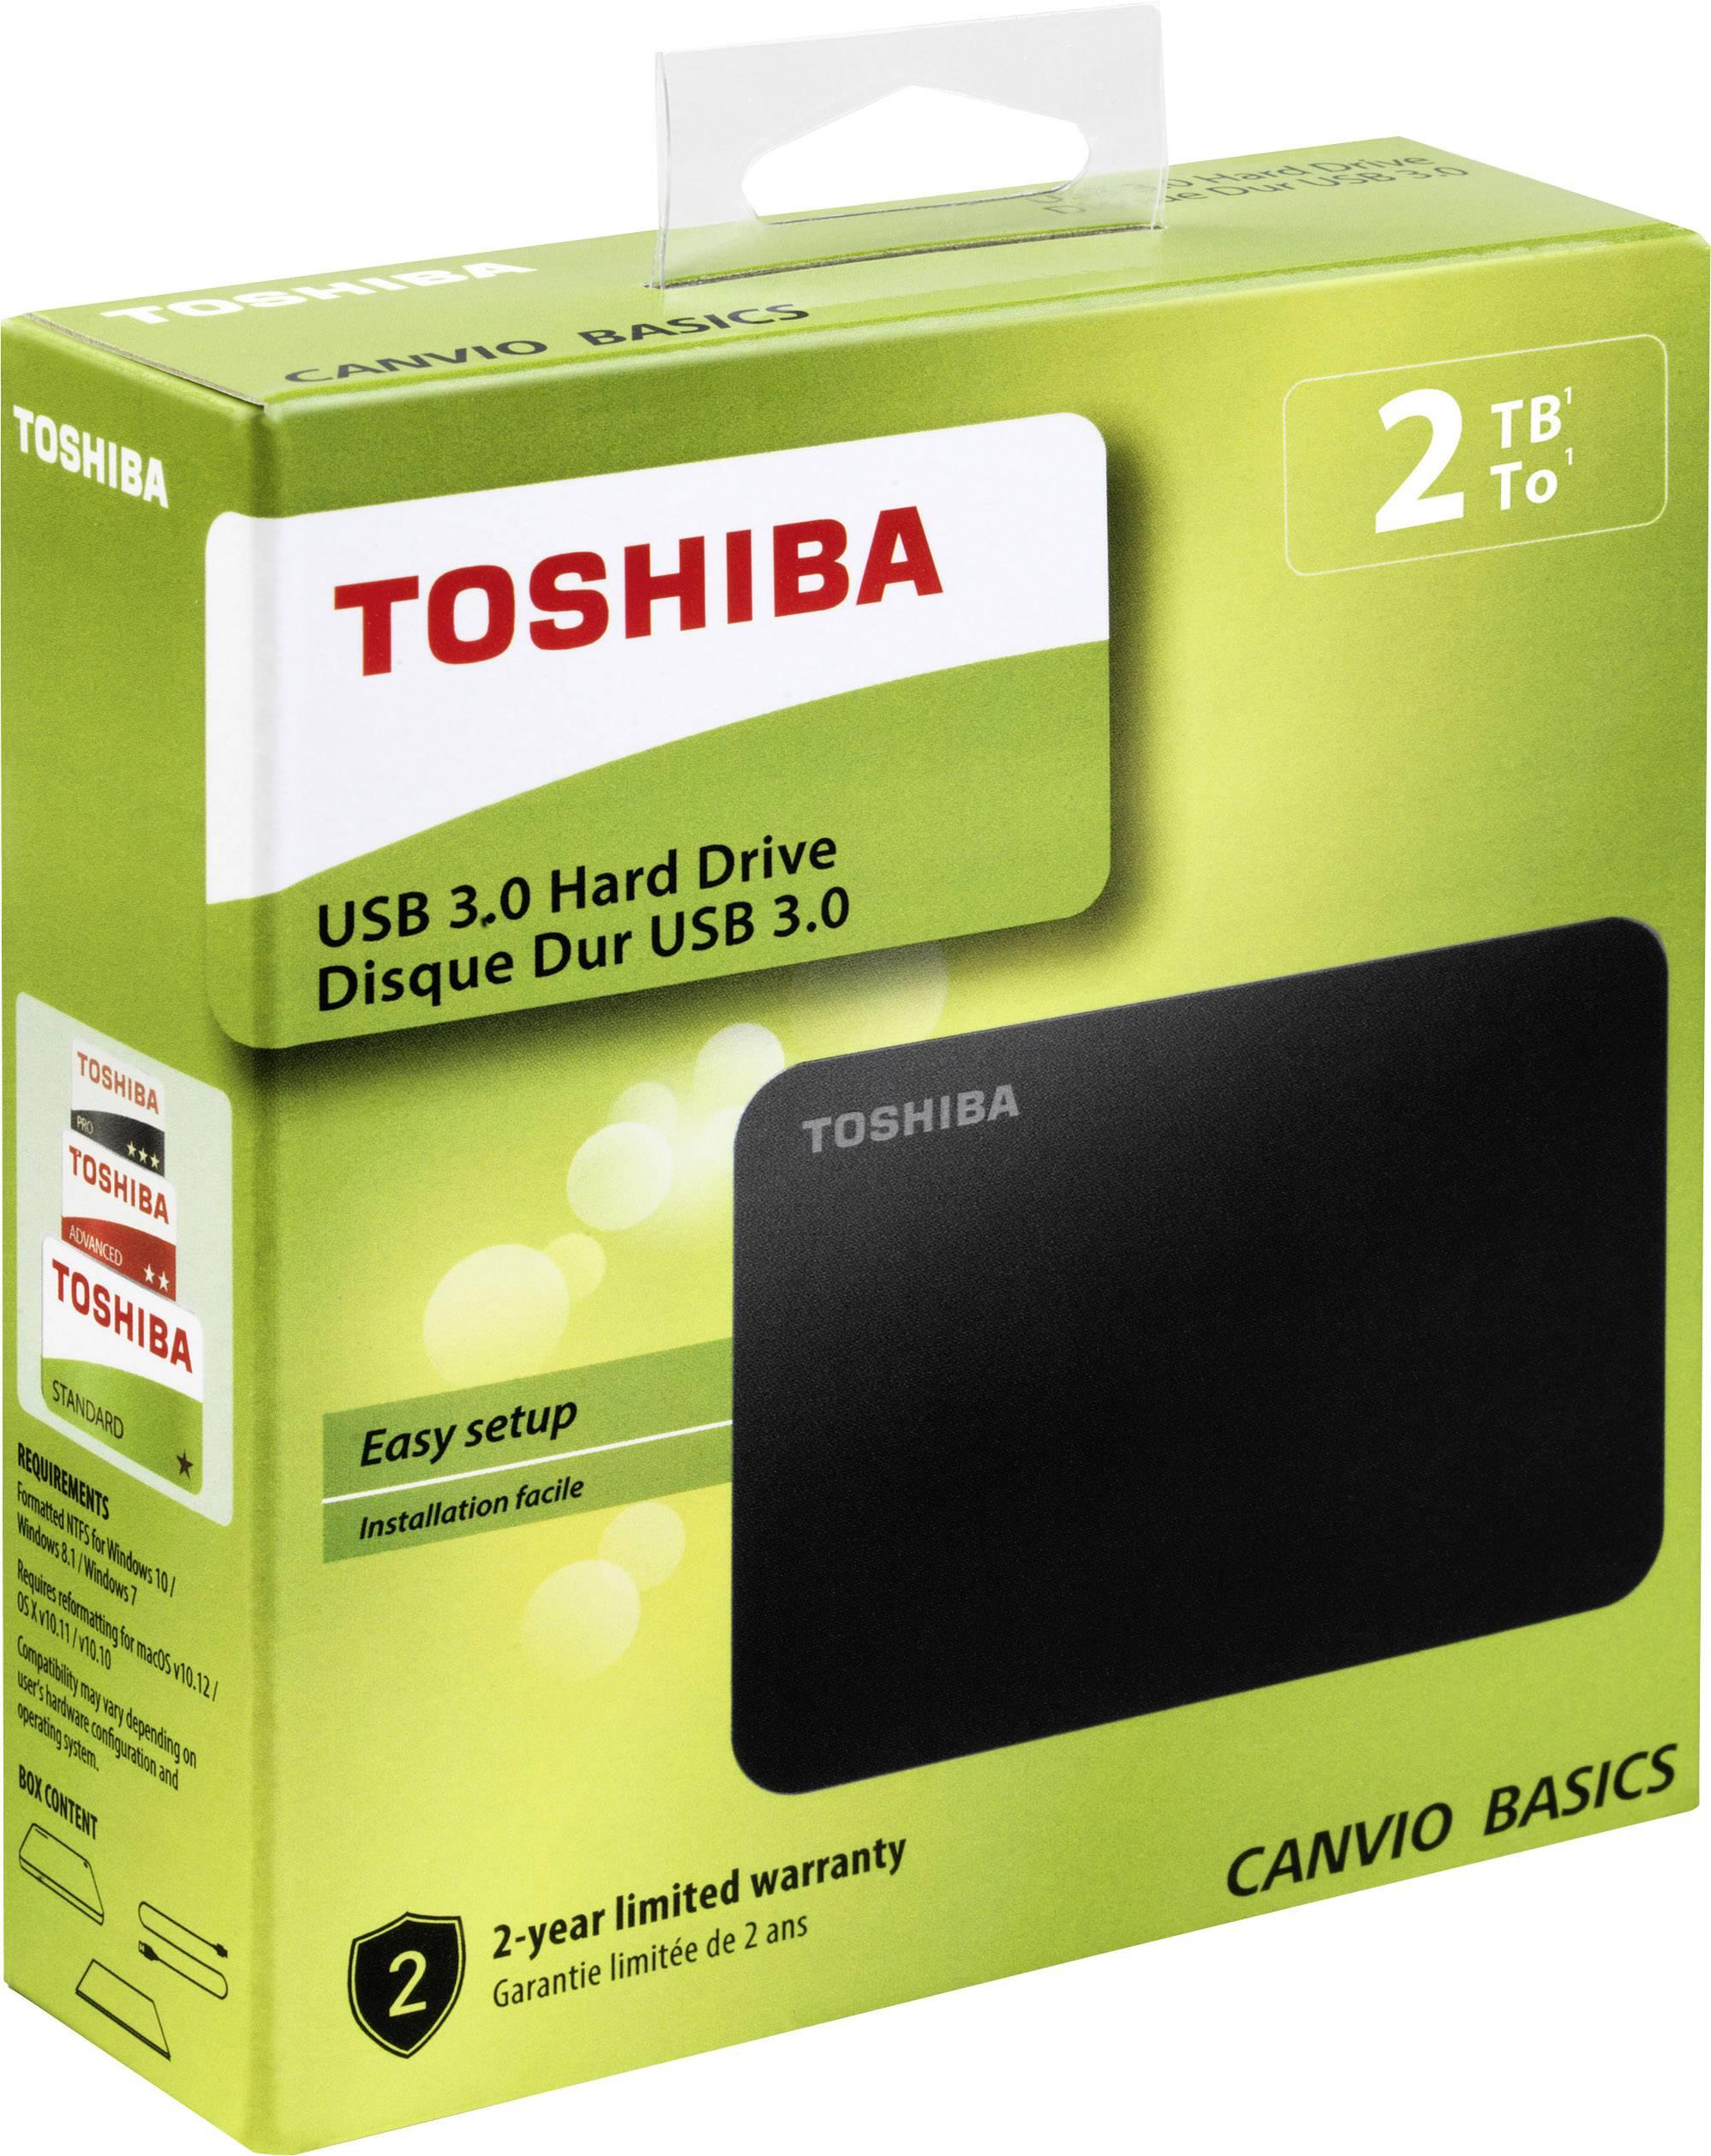 Toshiba Canvio 3.0 basic 1.0 TB